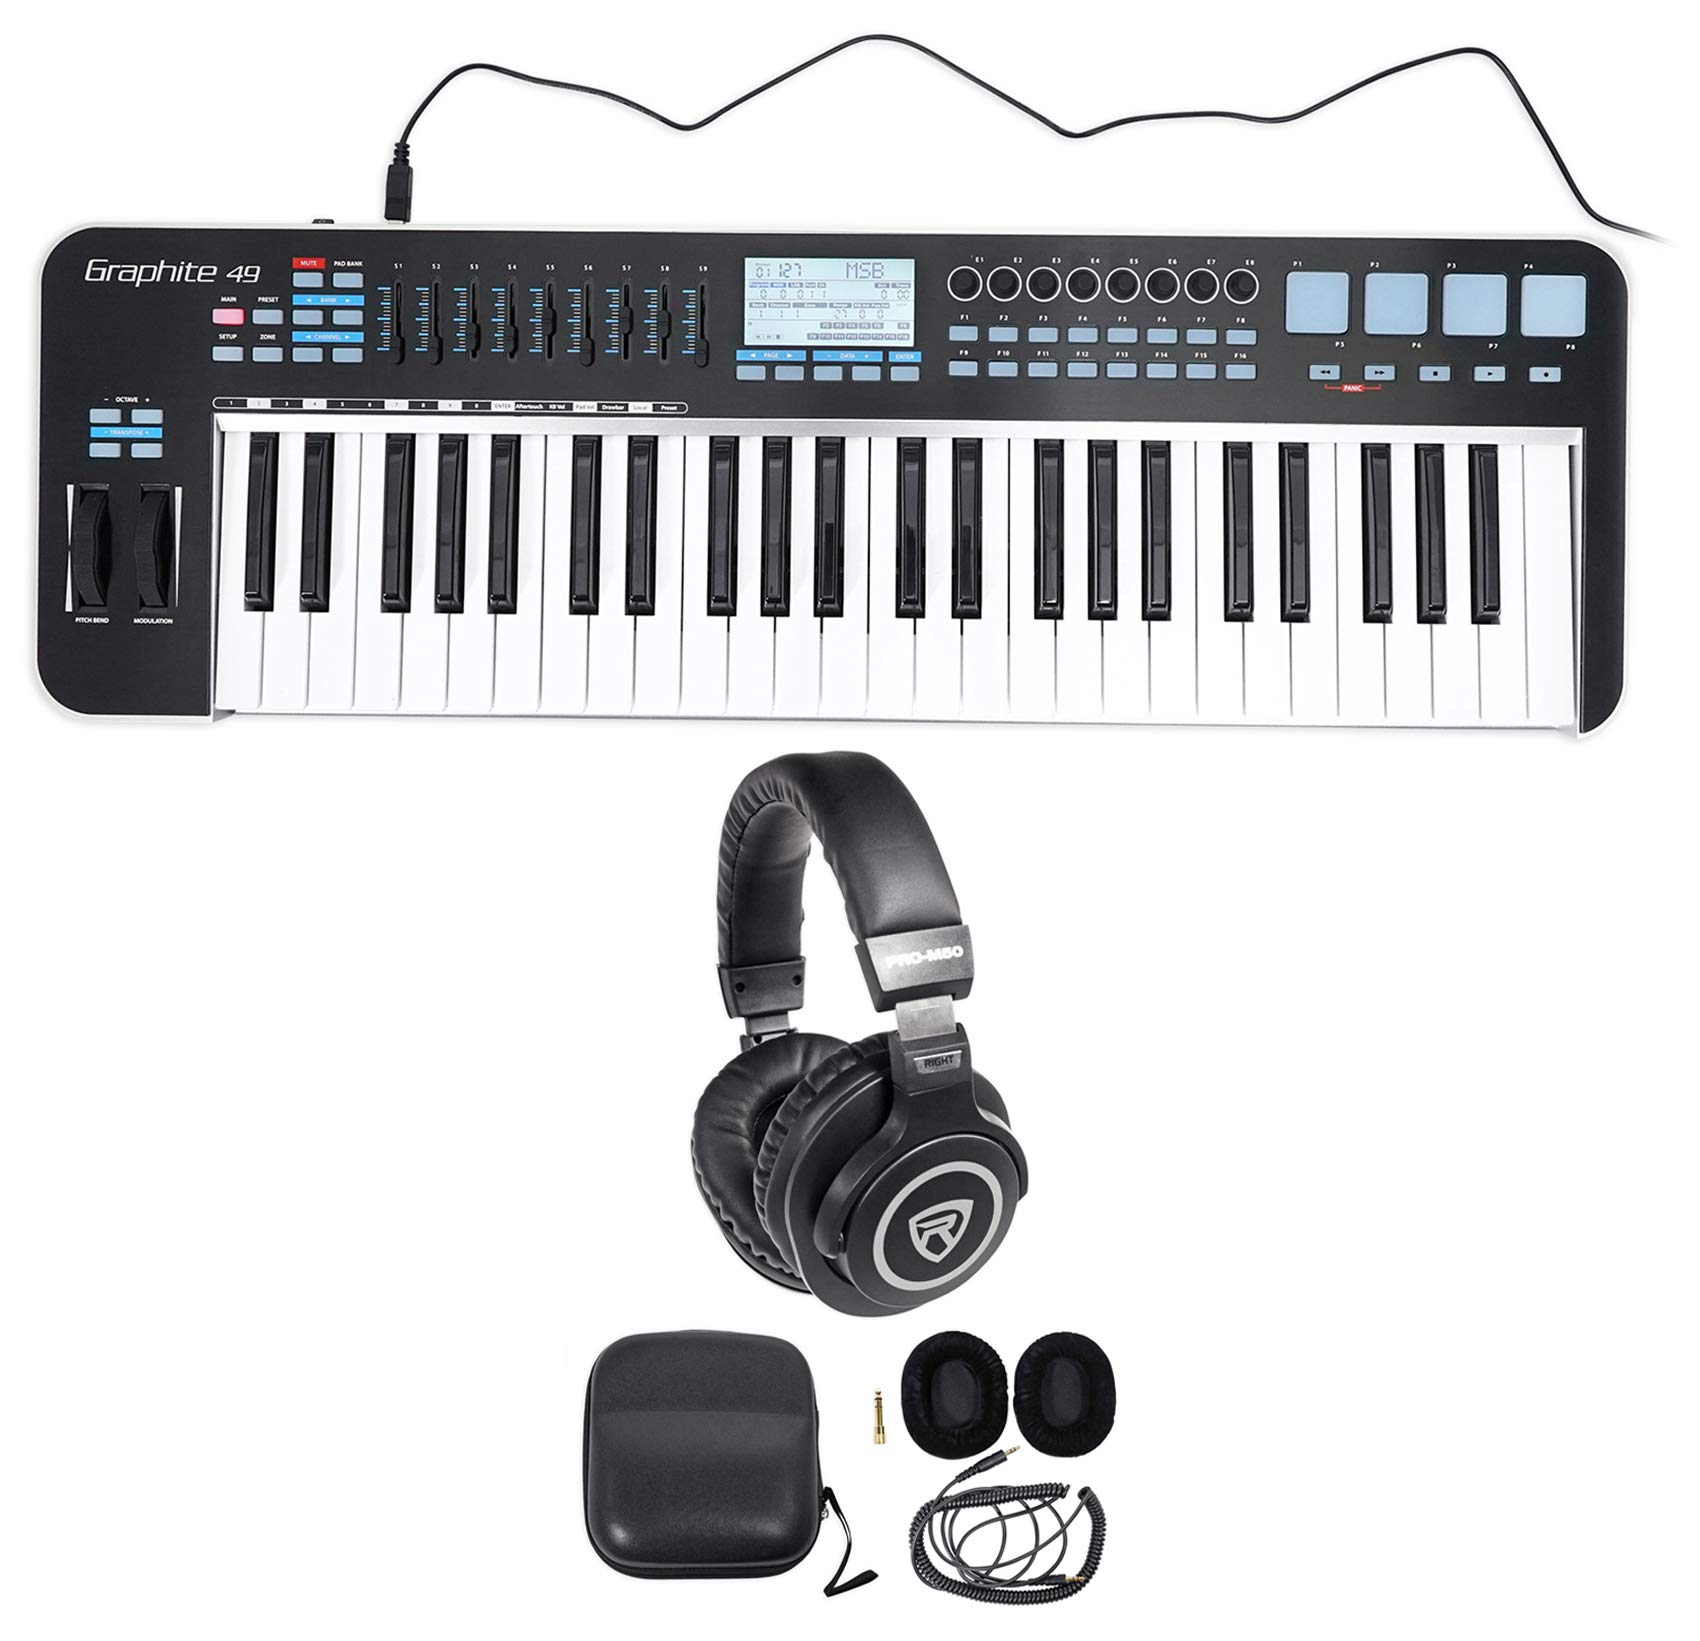 Samson Graphite 49 Key USB MIDI DJ Keyboard Controller w/Fader/Pads+Headphones